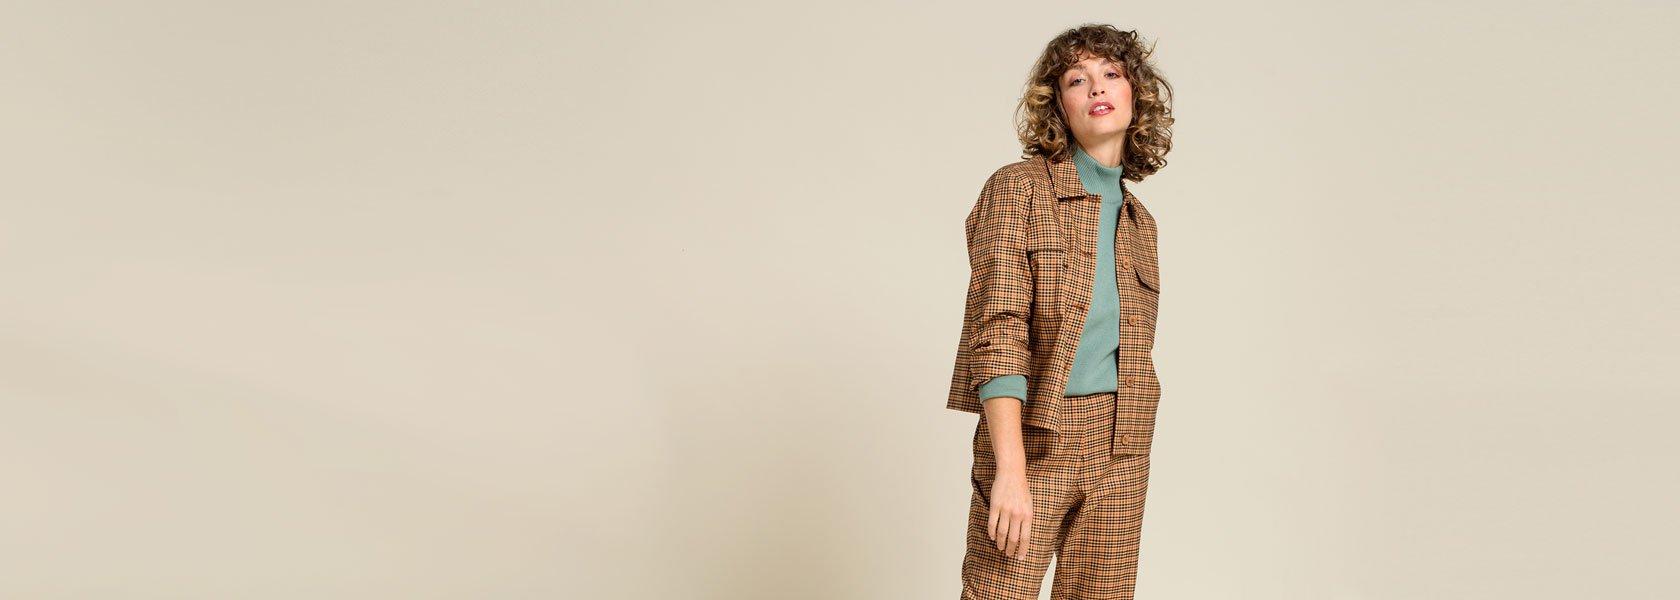 Frau trägt ökologische Mode